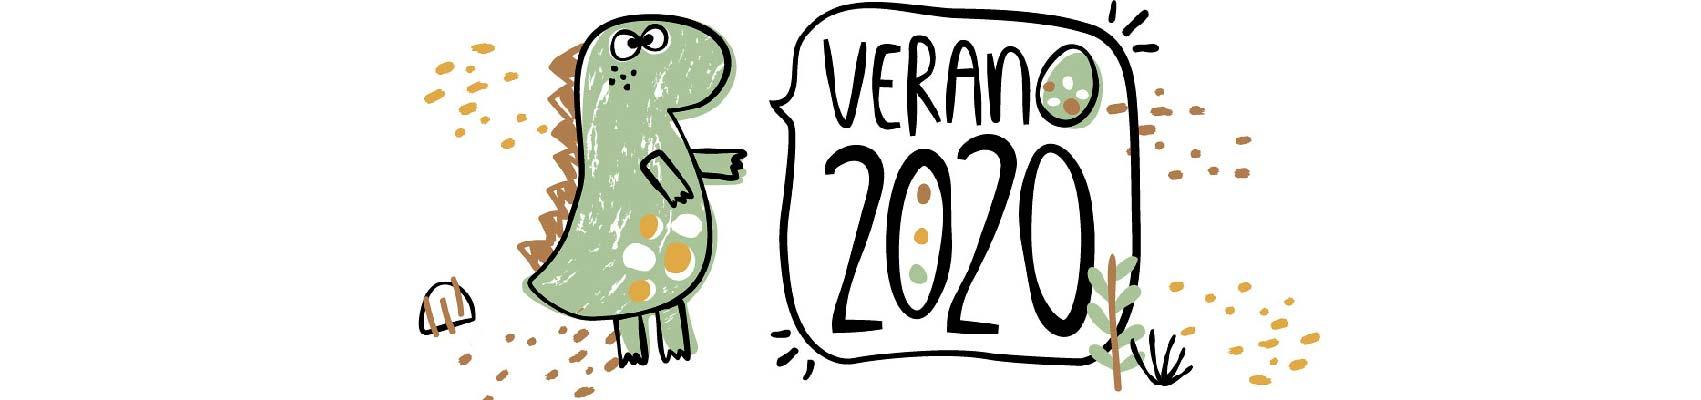 aram-mayorista-2020-01